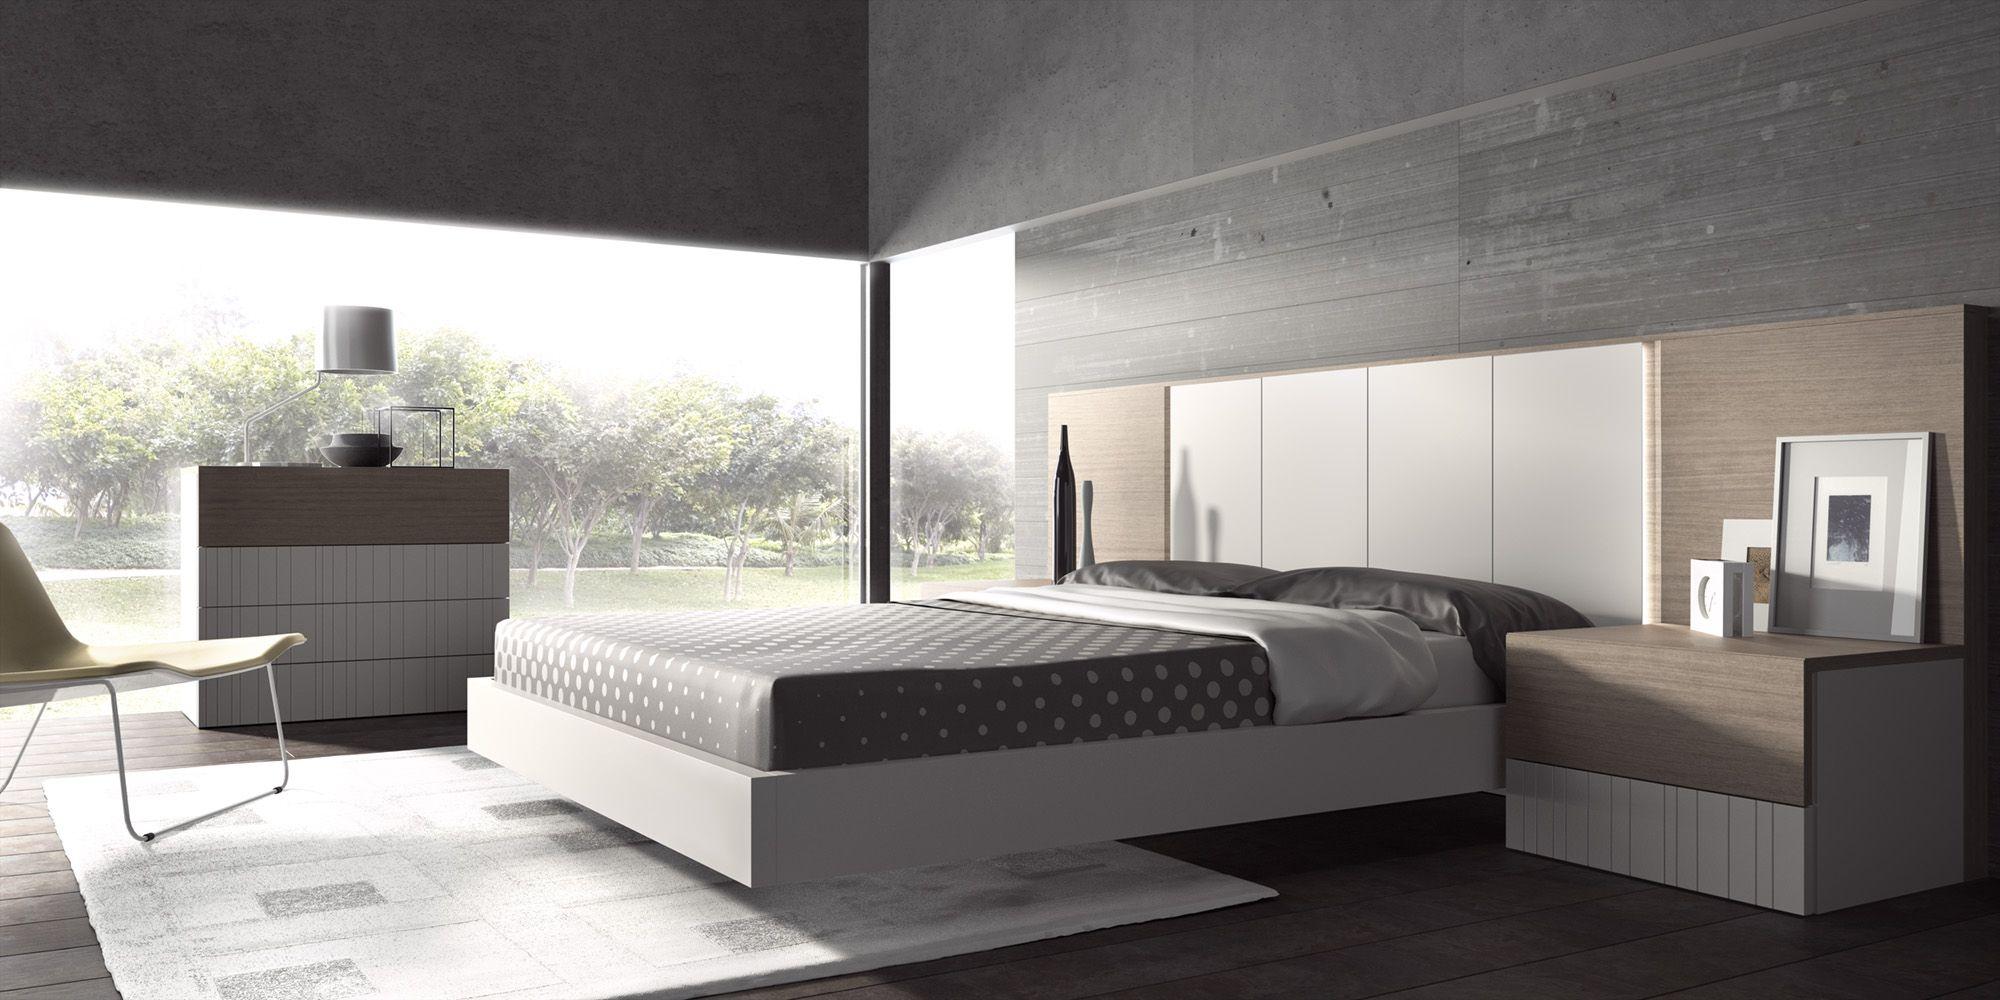 Camas Modernas   proyecto casa   Pinterest   Bedrooms and Modern